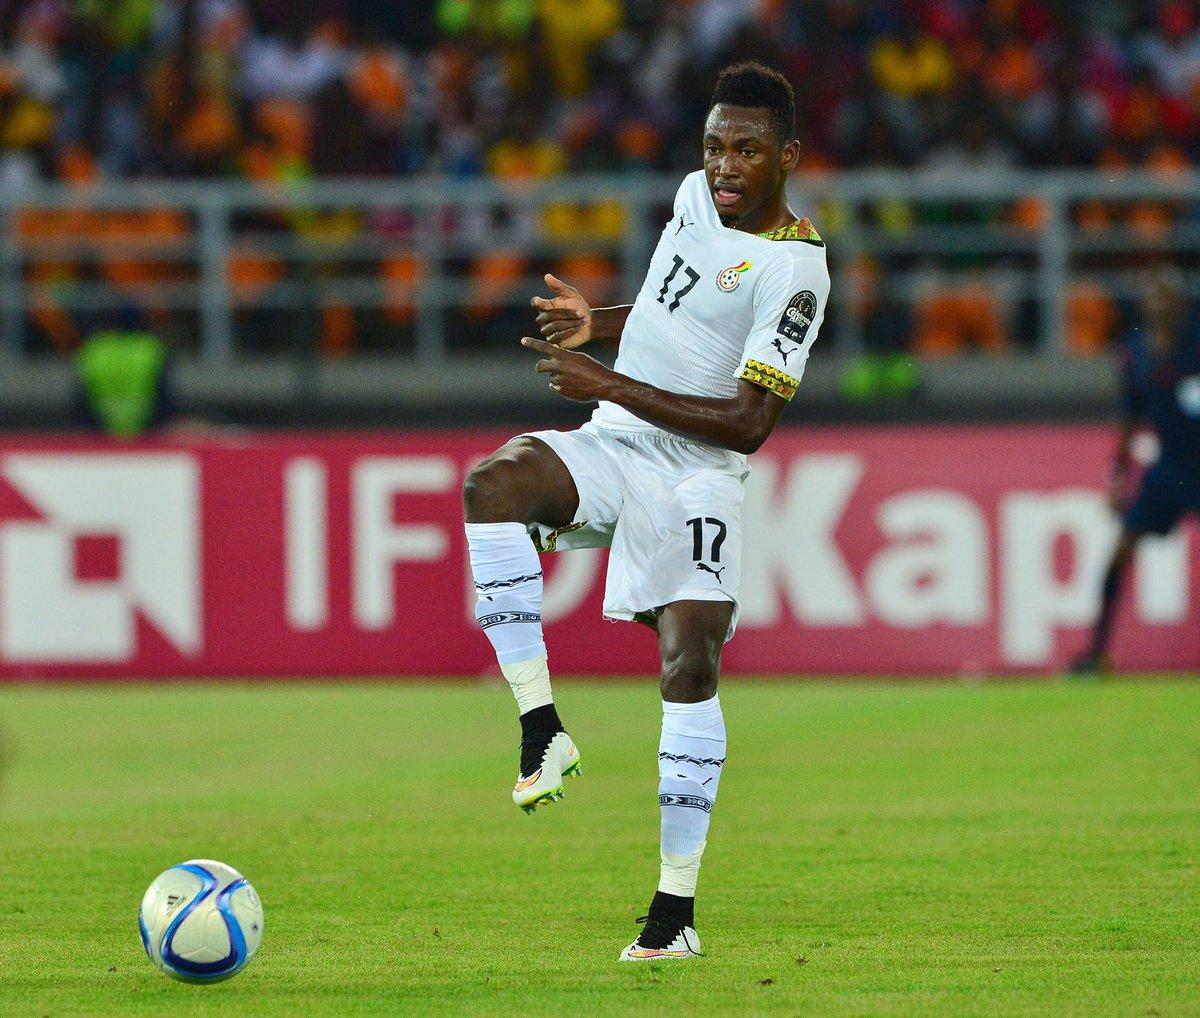 Happy Birthday to Ghana  international, Abdul Rahman Baba!   #AfricanFootball pic.twitter.com/v6Hdk0HyWn